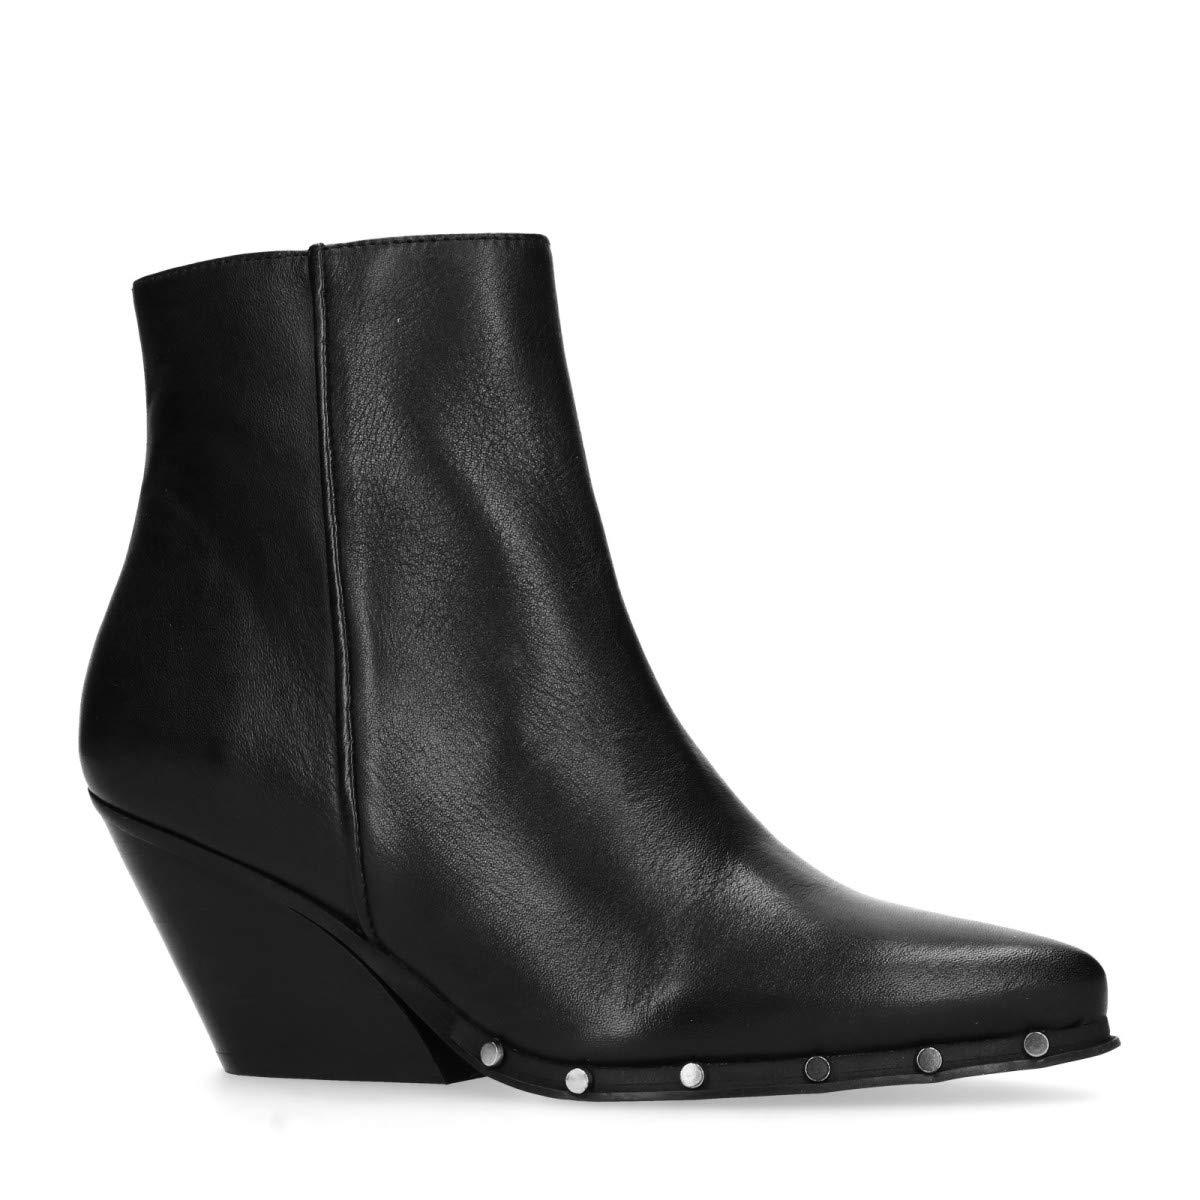 Sacha Schuhe Schuhe Schuhe   Damen Stiefeletten   Leder   Farbe  Weiß 8e0de9